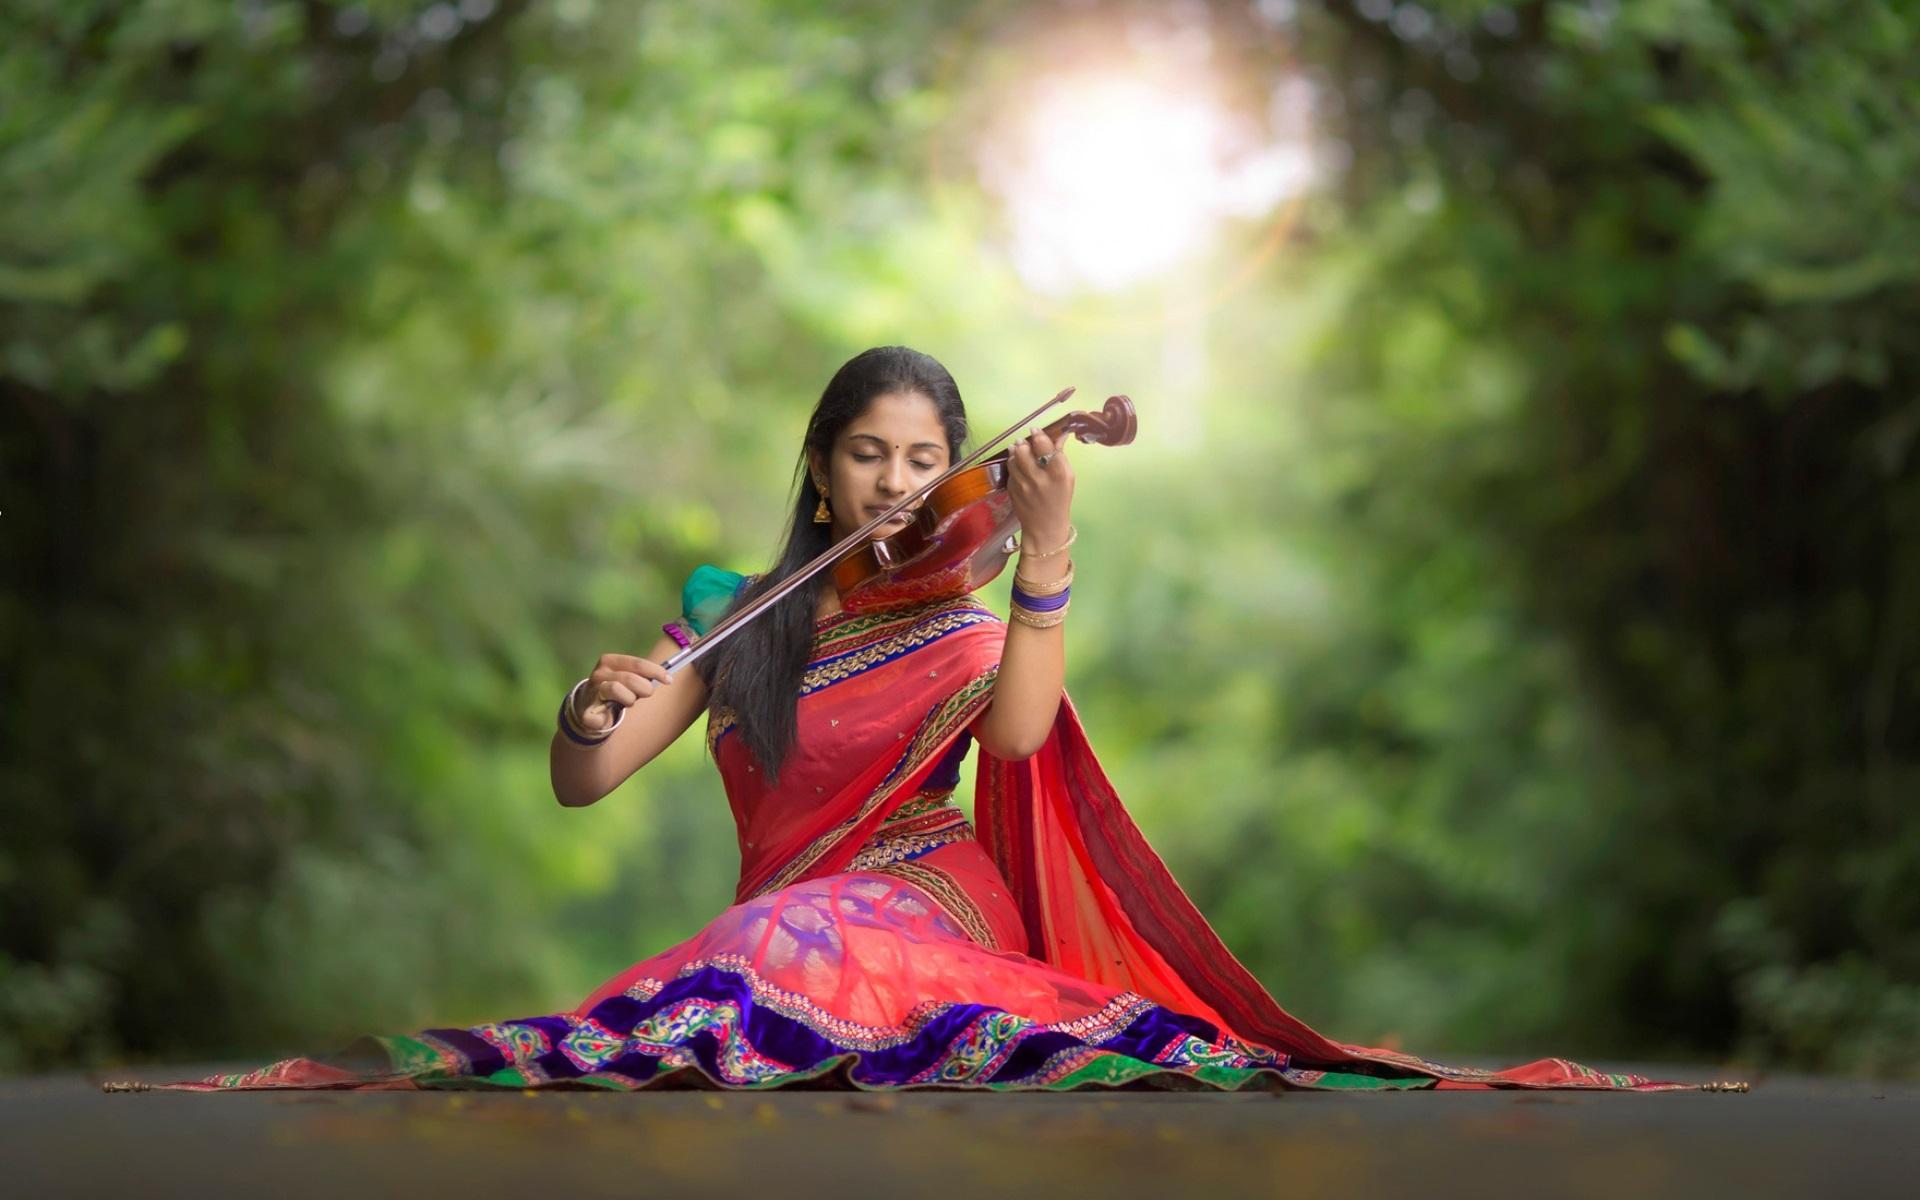 Wallpaper Hd Surfer Girl Indian Girl Violin Music Road Wallpaper Girls